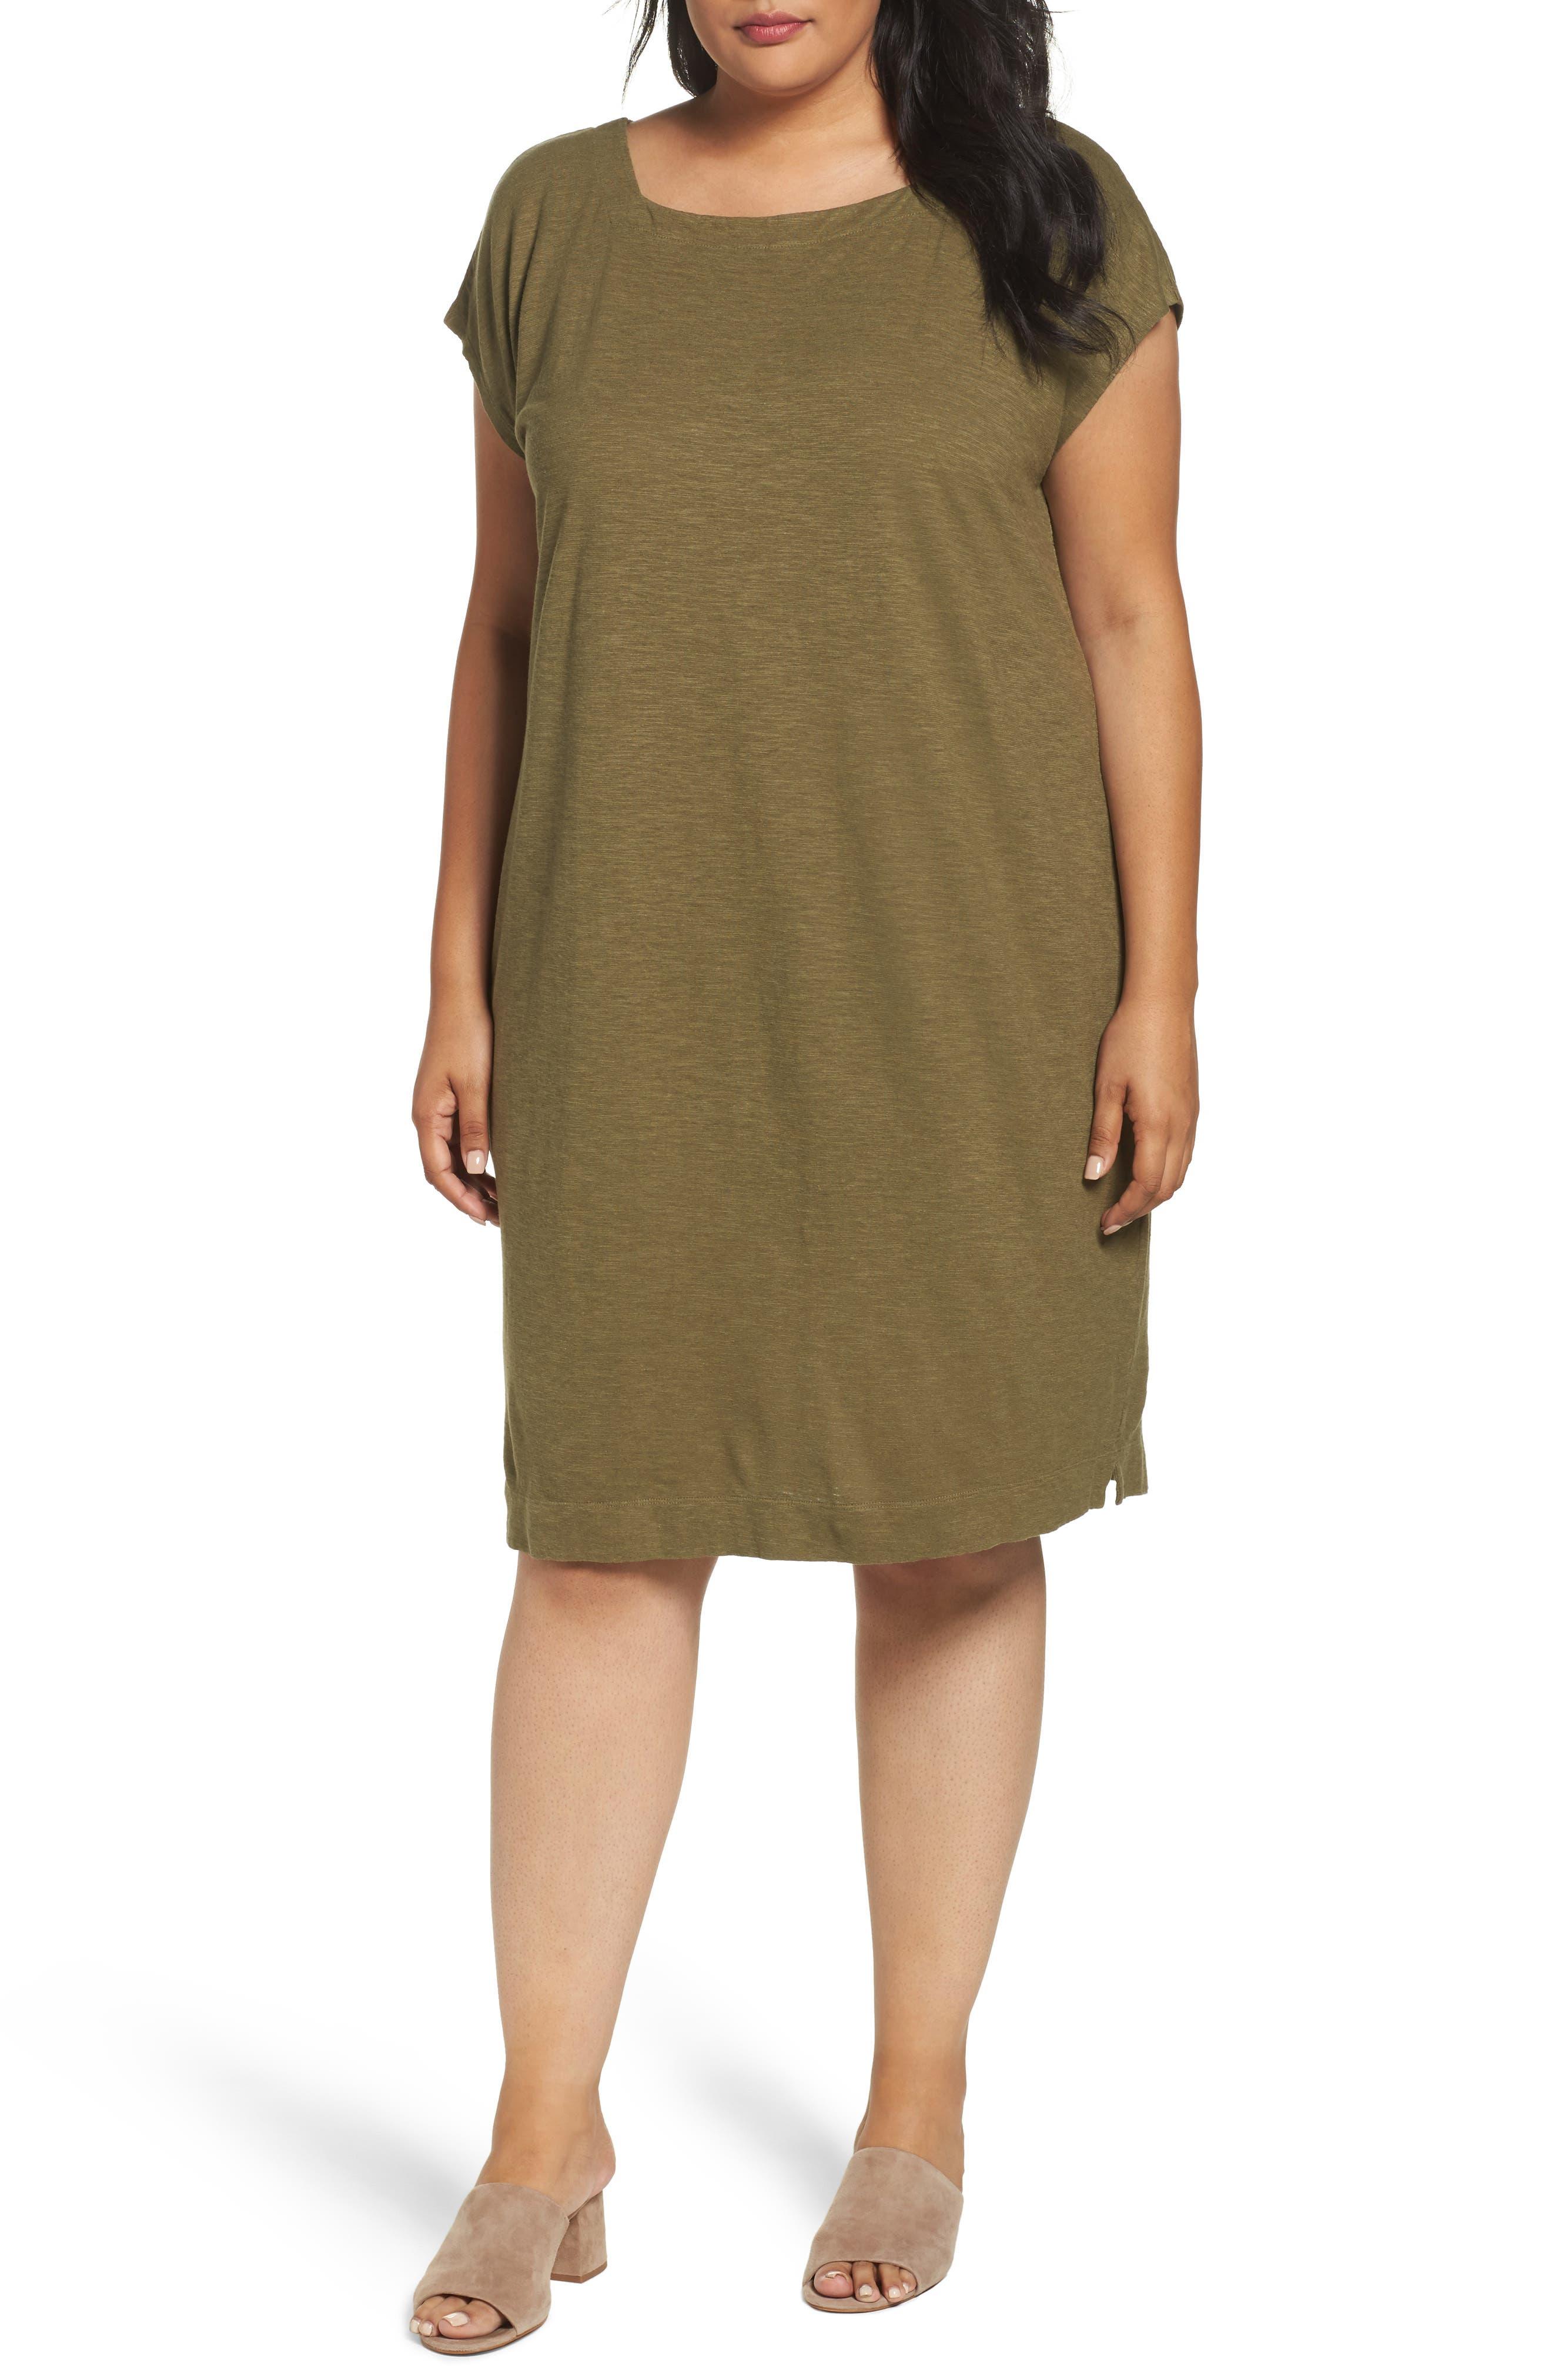 Eileen Fisher Hemp & Organic Square Neck Shift Dress (Plus Size)